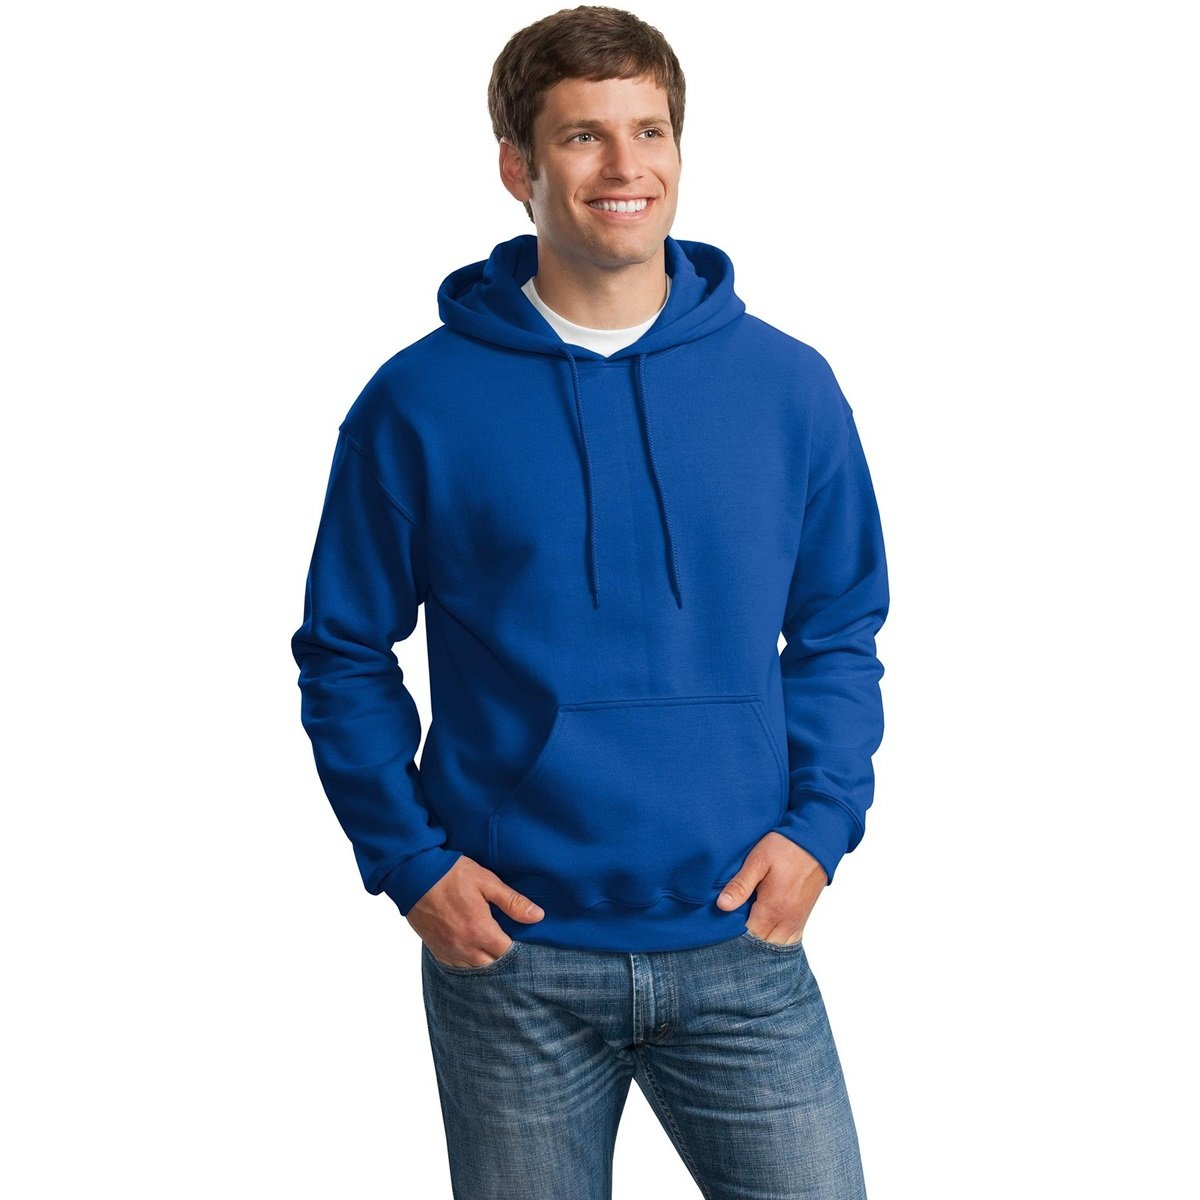 Royal Devious Apparel Gildan G12500 DryBlend Adult Hooded Sweatshirt